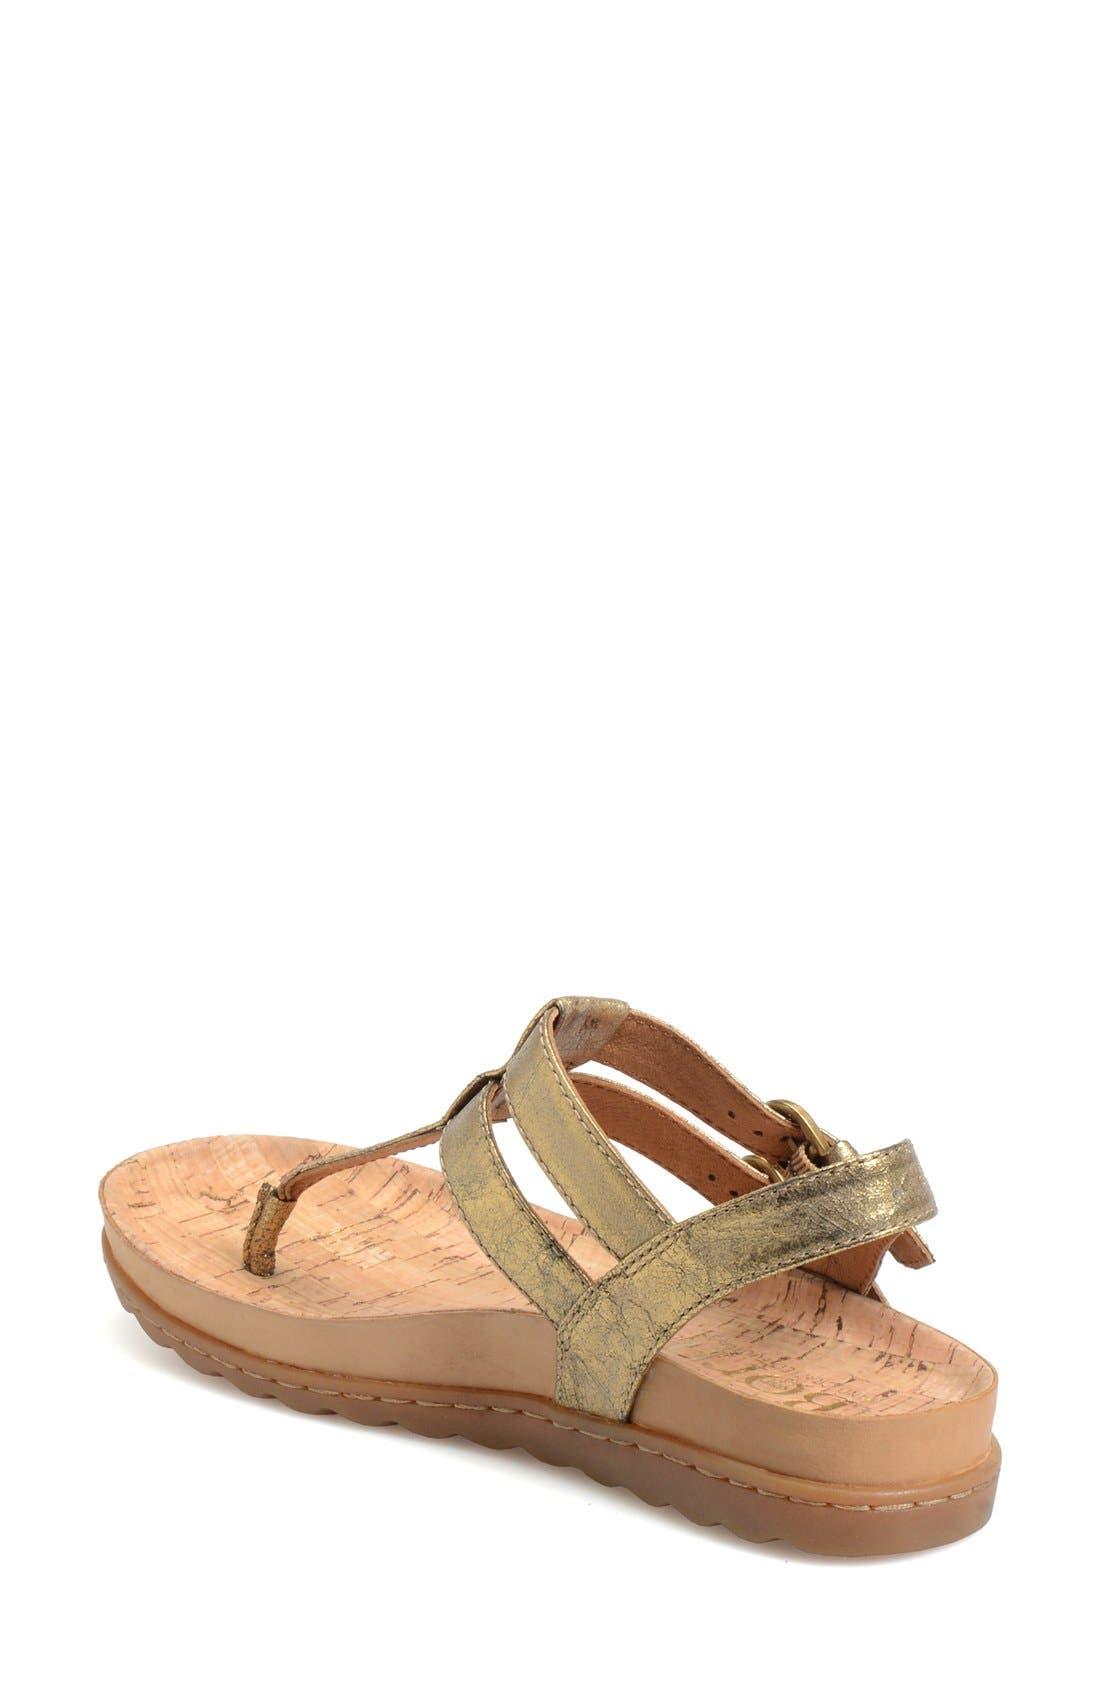 Alternate Image 2  - Børn 'Reta' Leather Thong Sandal (Women)